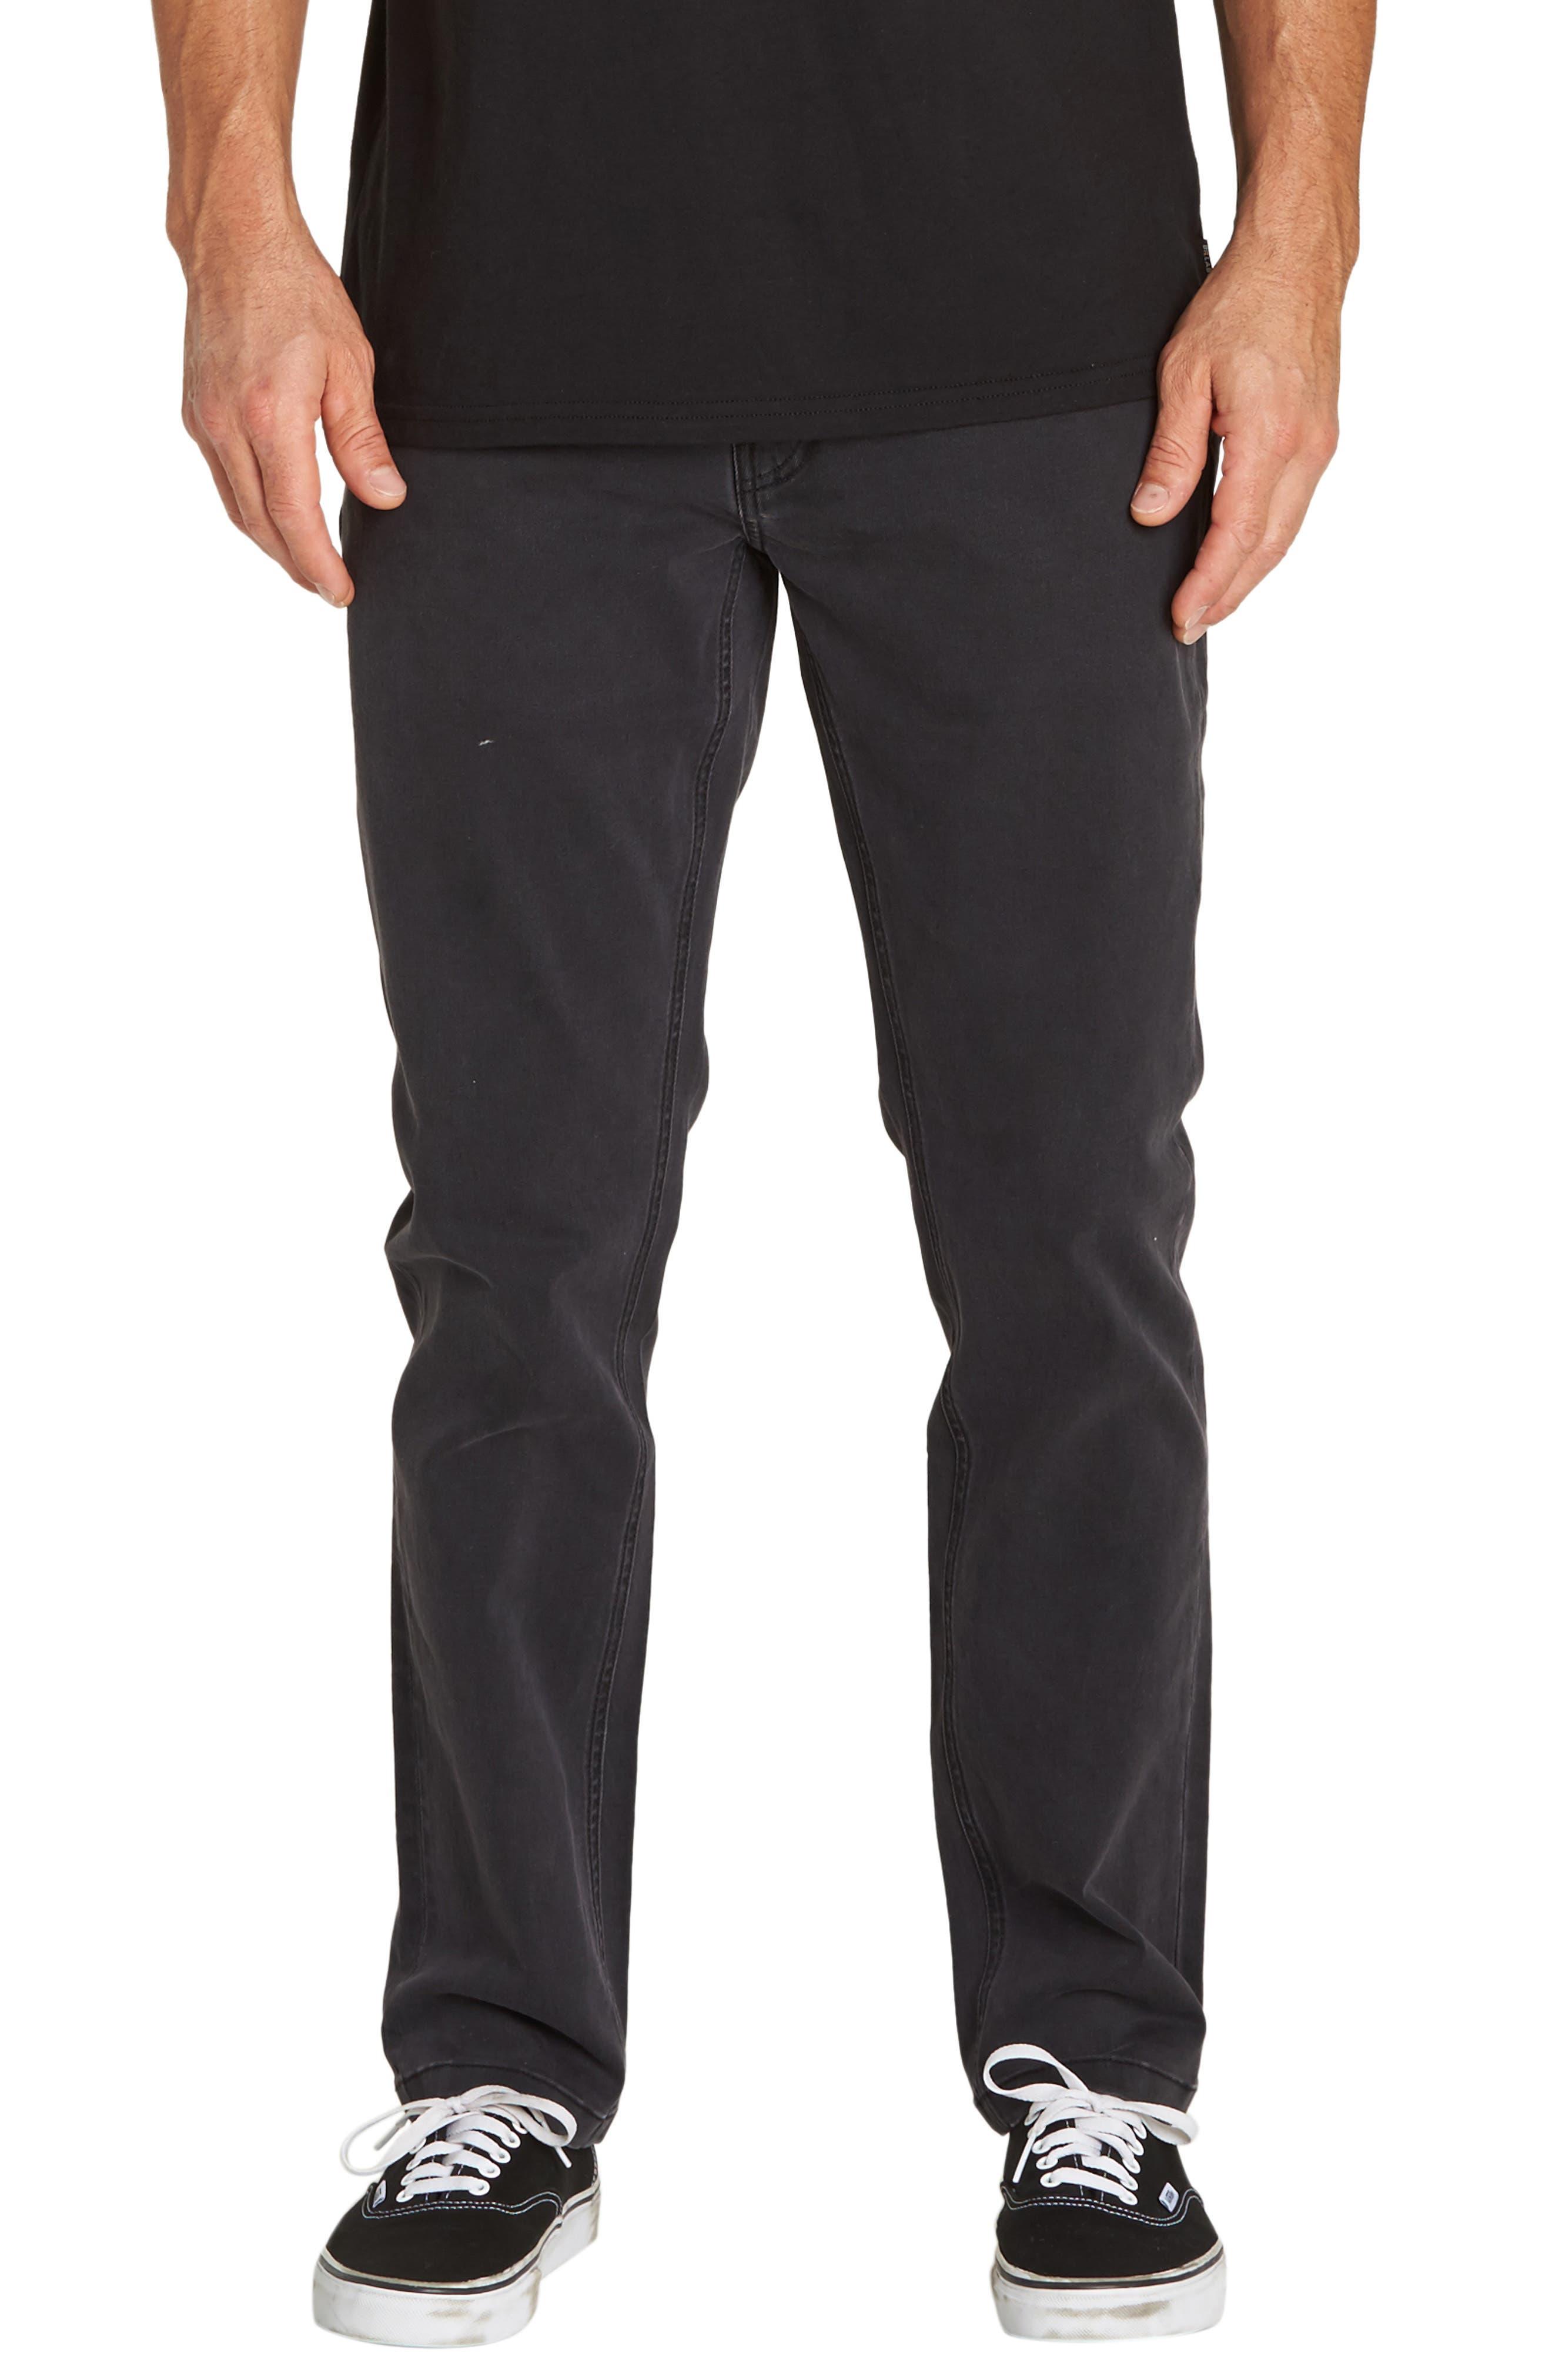 Outsider Slim Straight Jeans,                             Main thumbnail 1, color,                             OIL SPILL